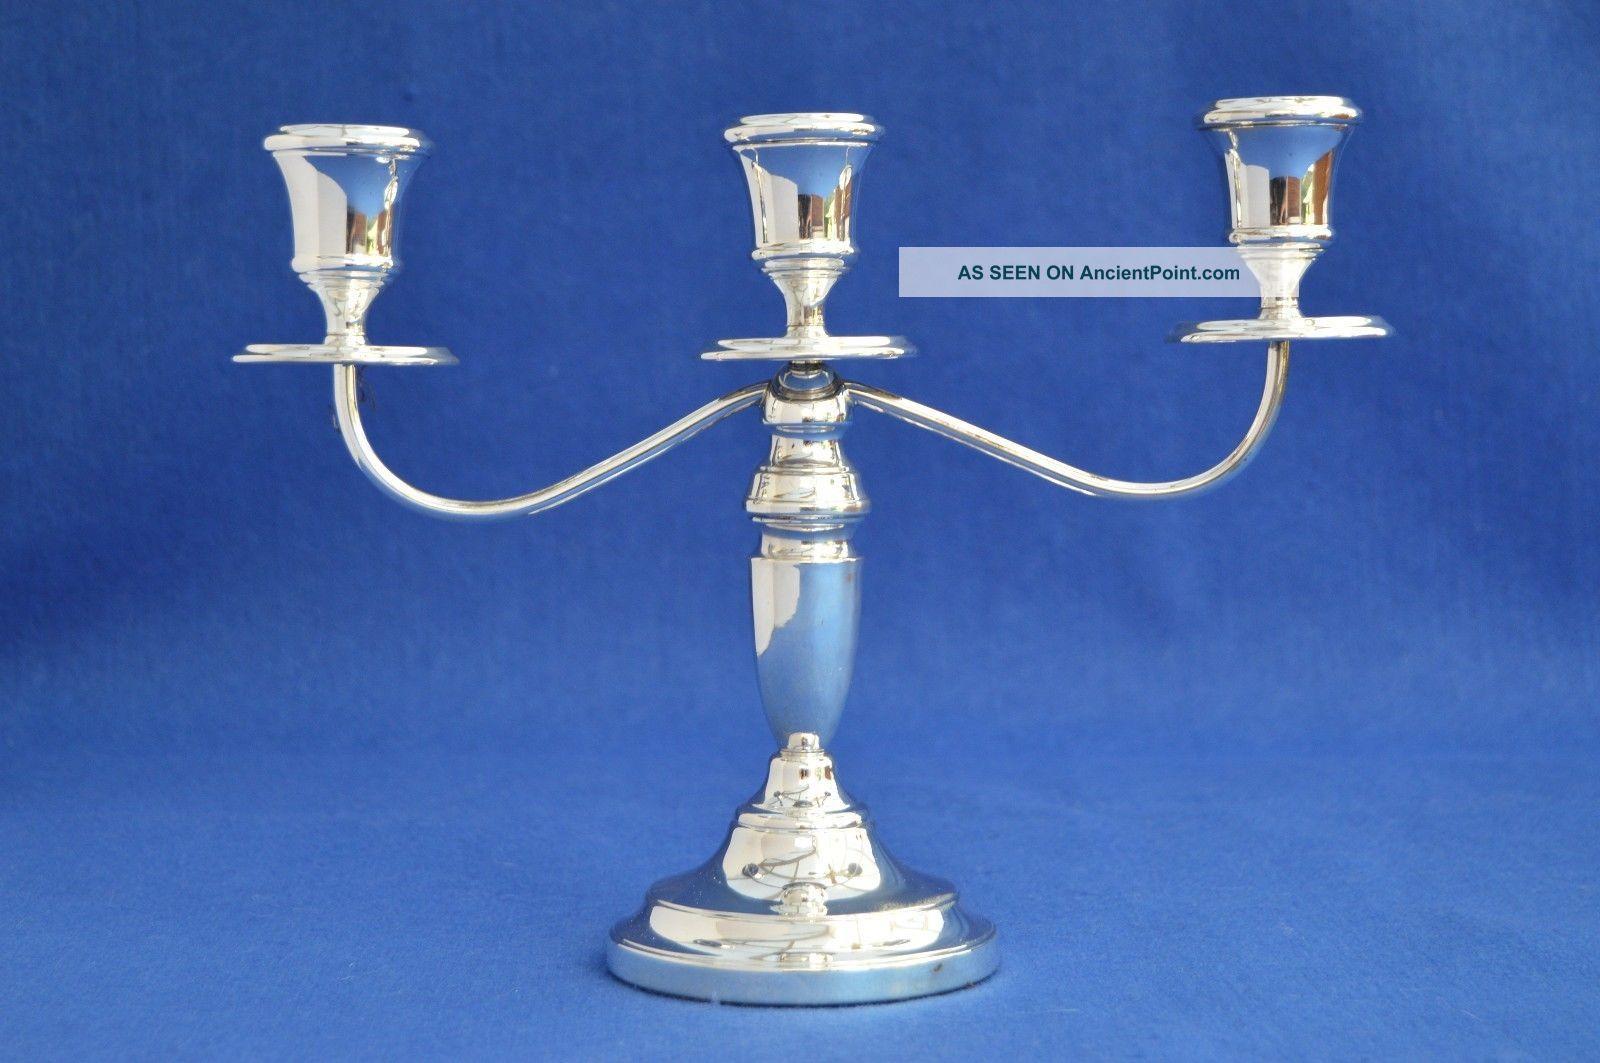 Vintage Solid Silver Candelabra - Birmingham 1975 - Candle Holders Three Branch Candlesticks & Candelabra photo